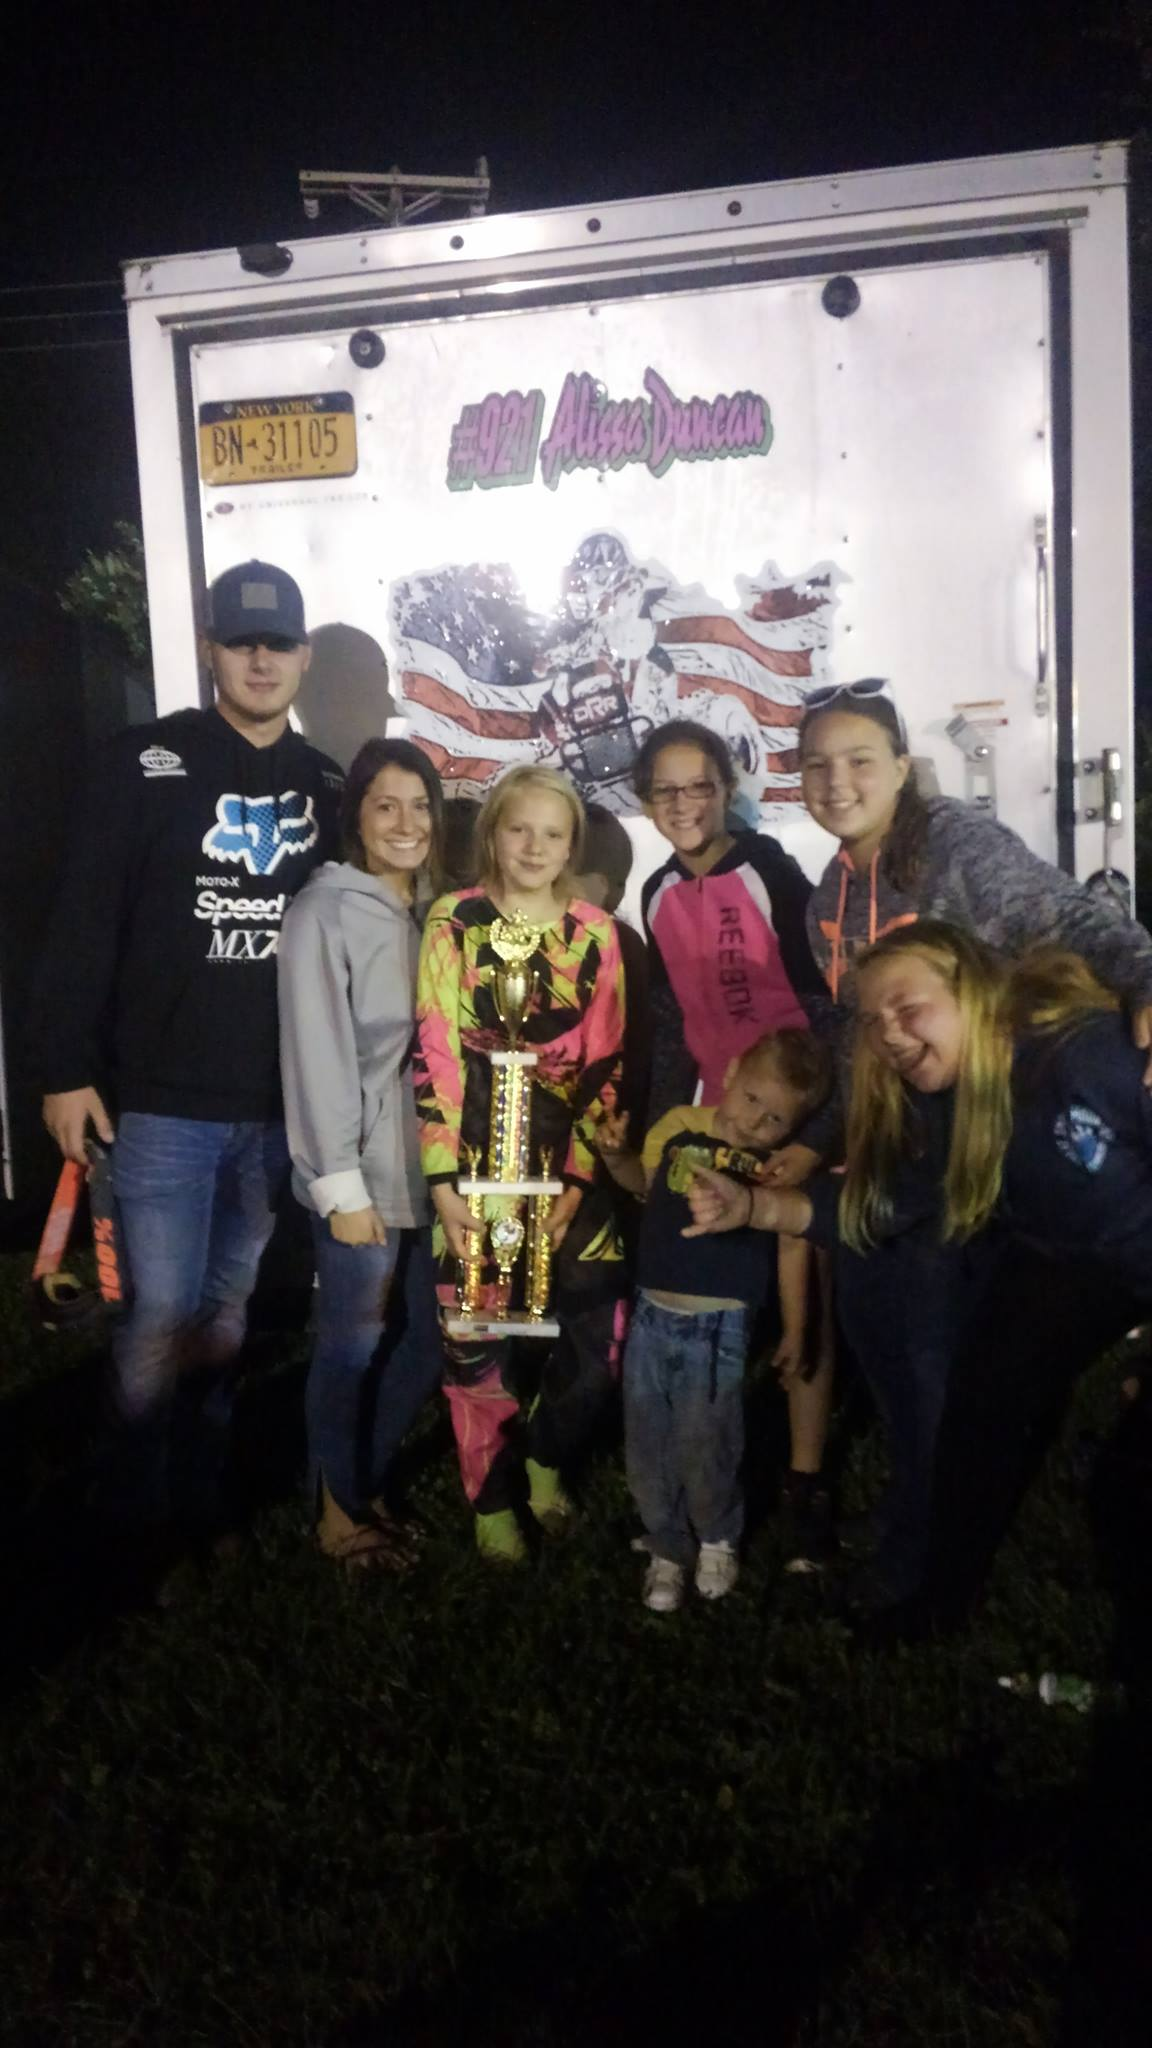 - Team Duncan #921 racing a hard fought championship at Royal Mountain Monster Energy Supercross - Photo credit Team Duncan #921 Racing